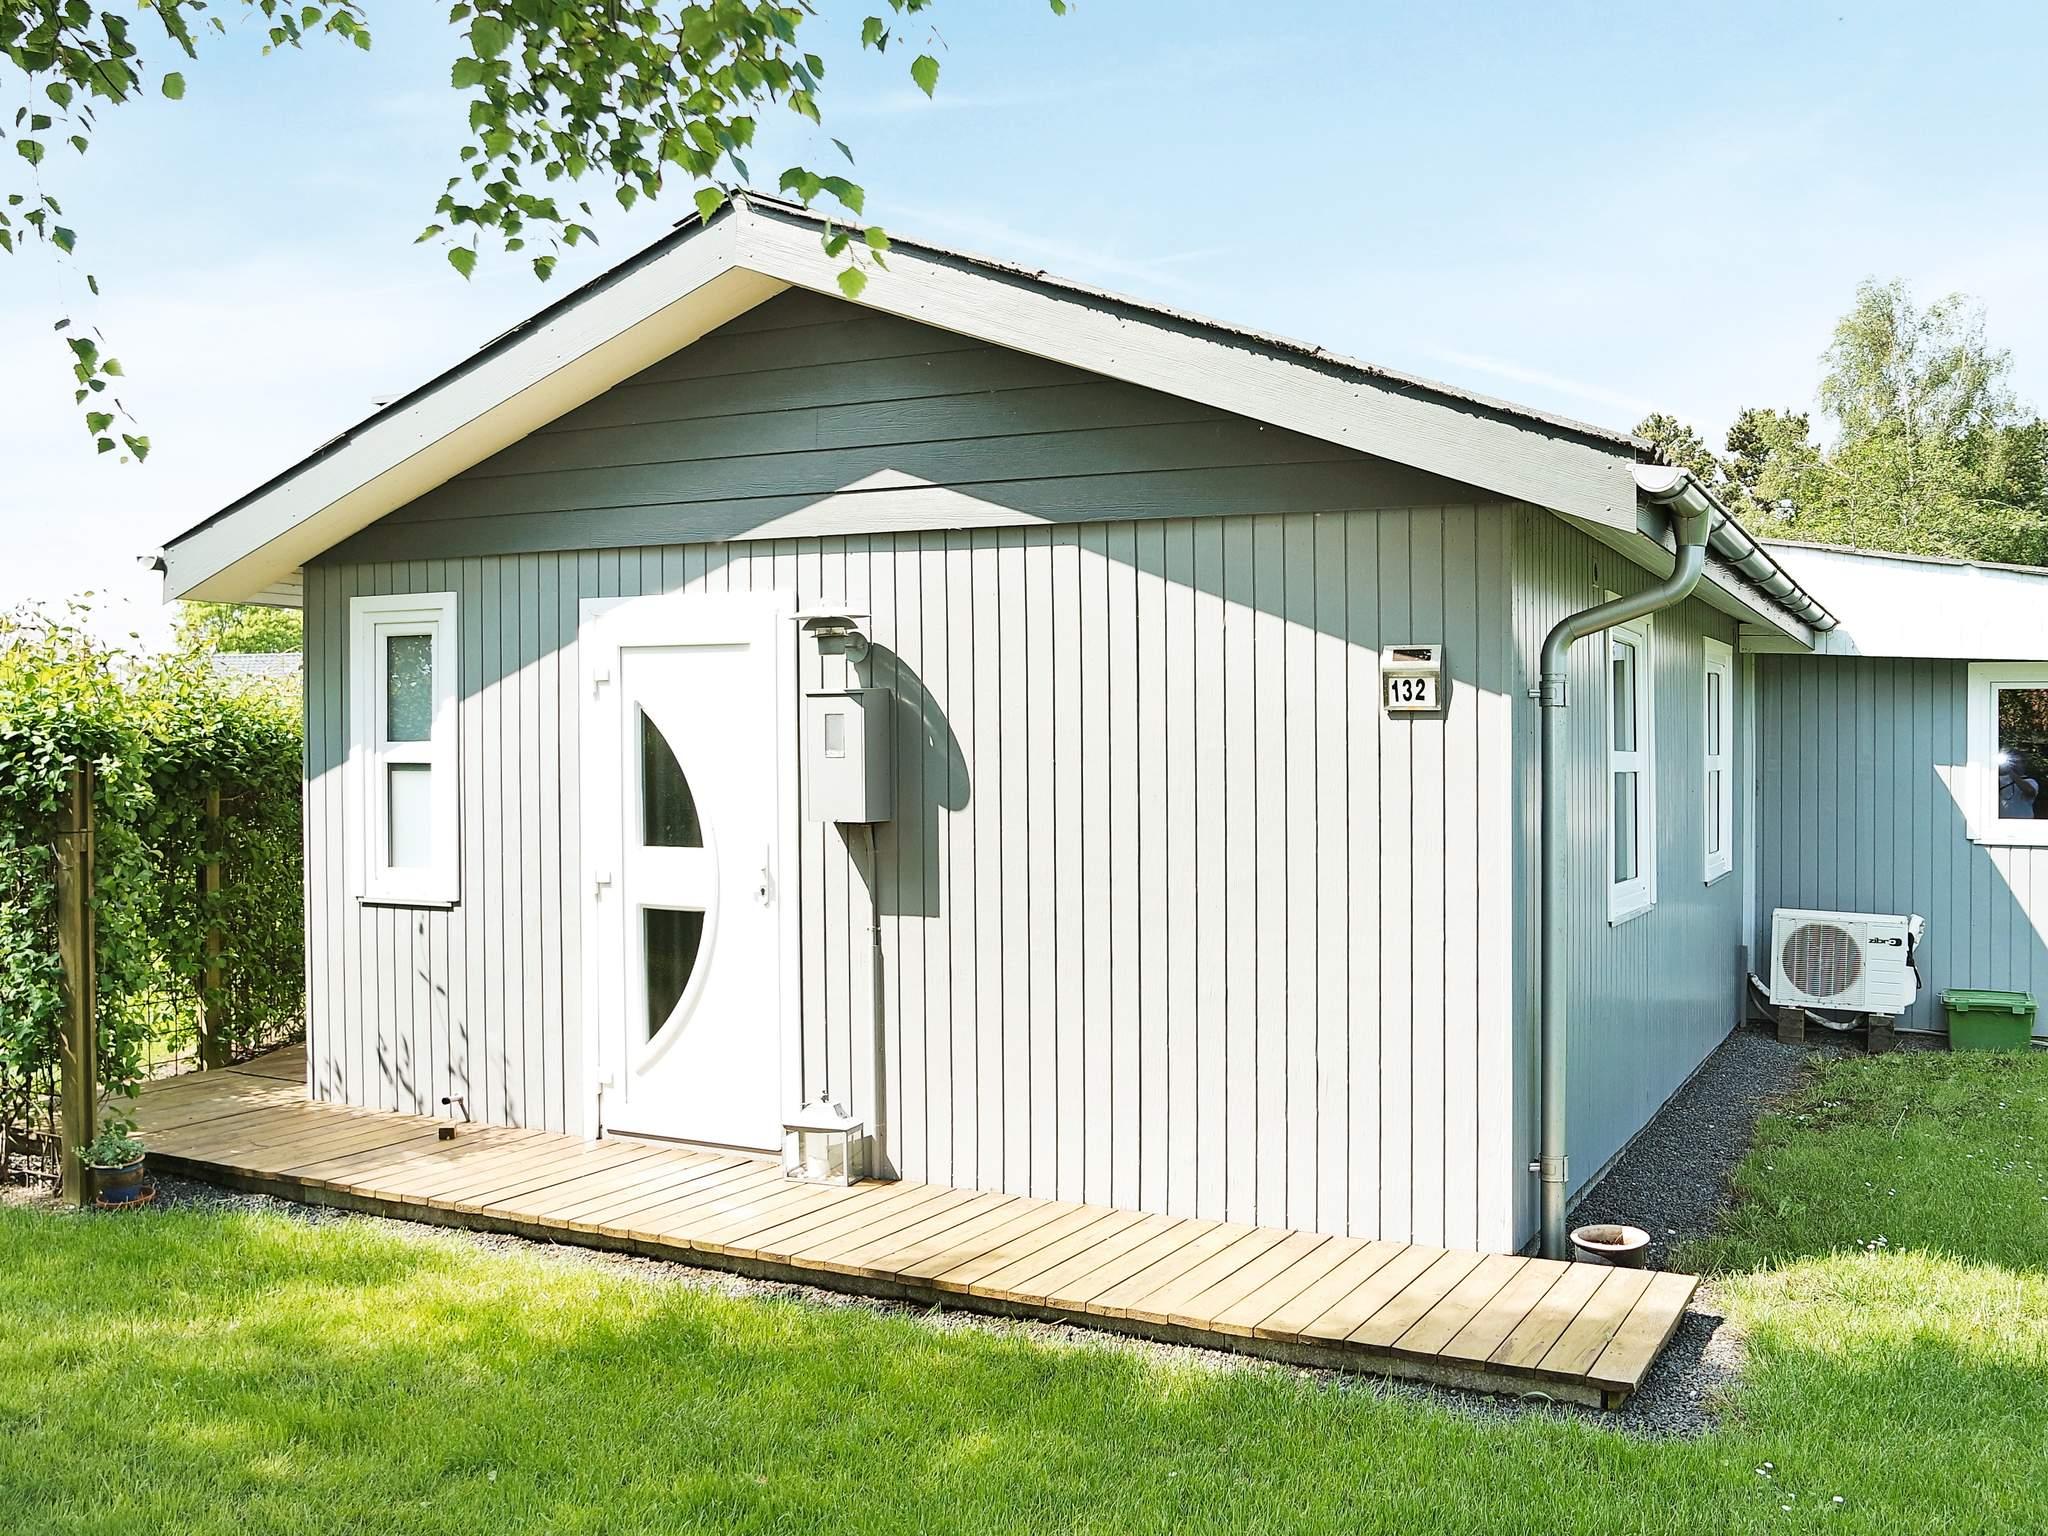 Ferienhaus Øster Hurup (85519), Øster Hurup, , Ostjütland, Dänemark, Bild 3